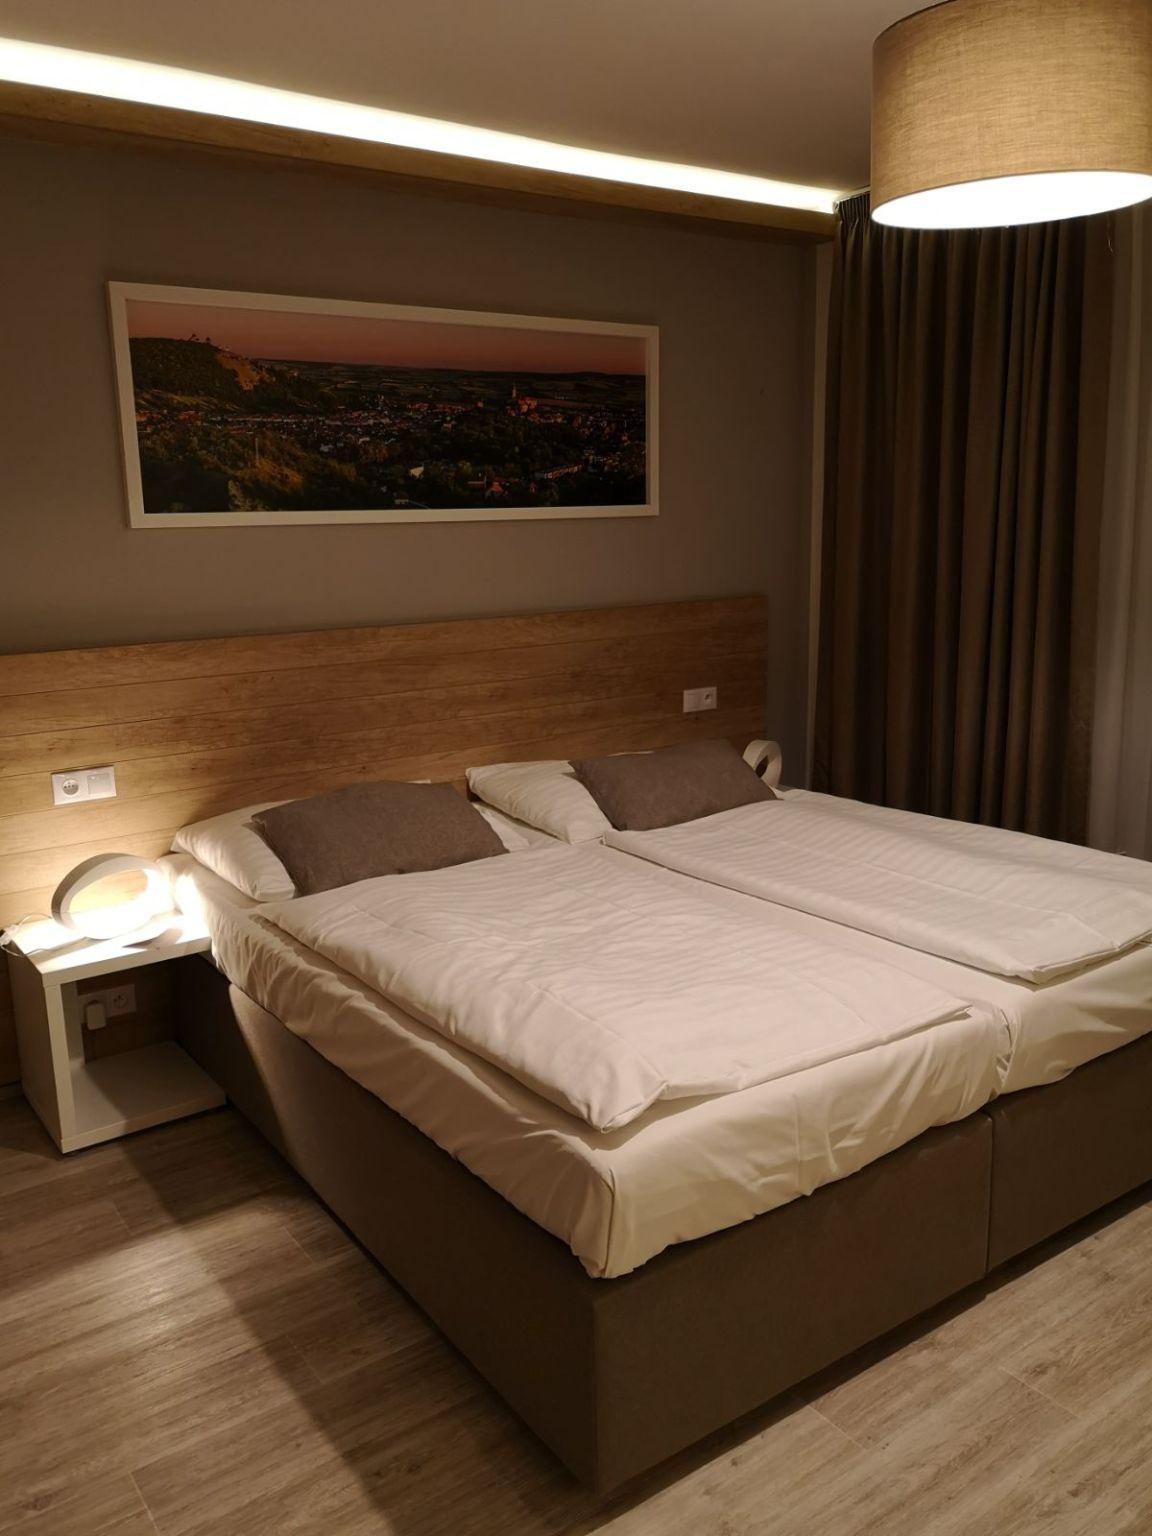 aqualand inn hotel morawy pokój